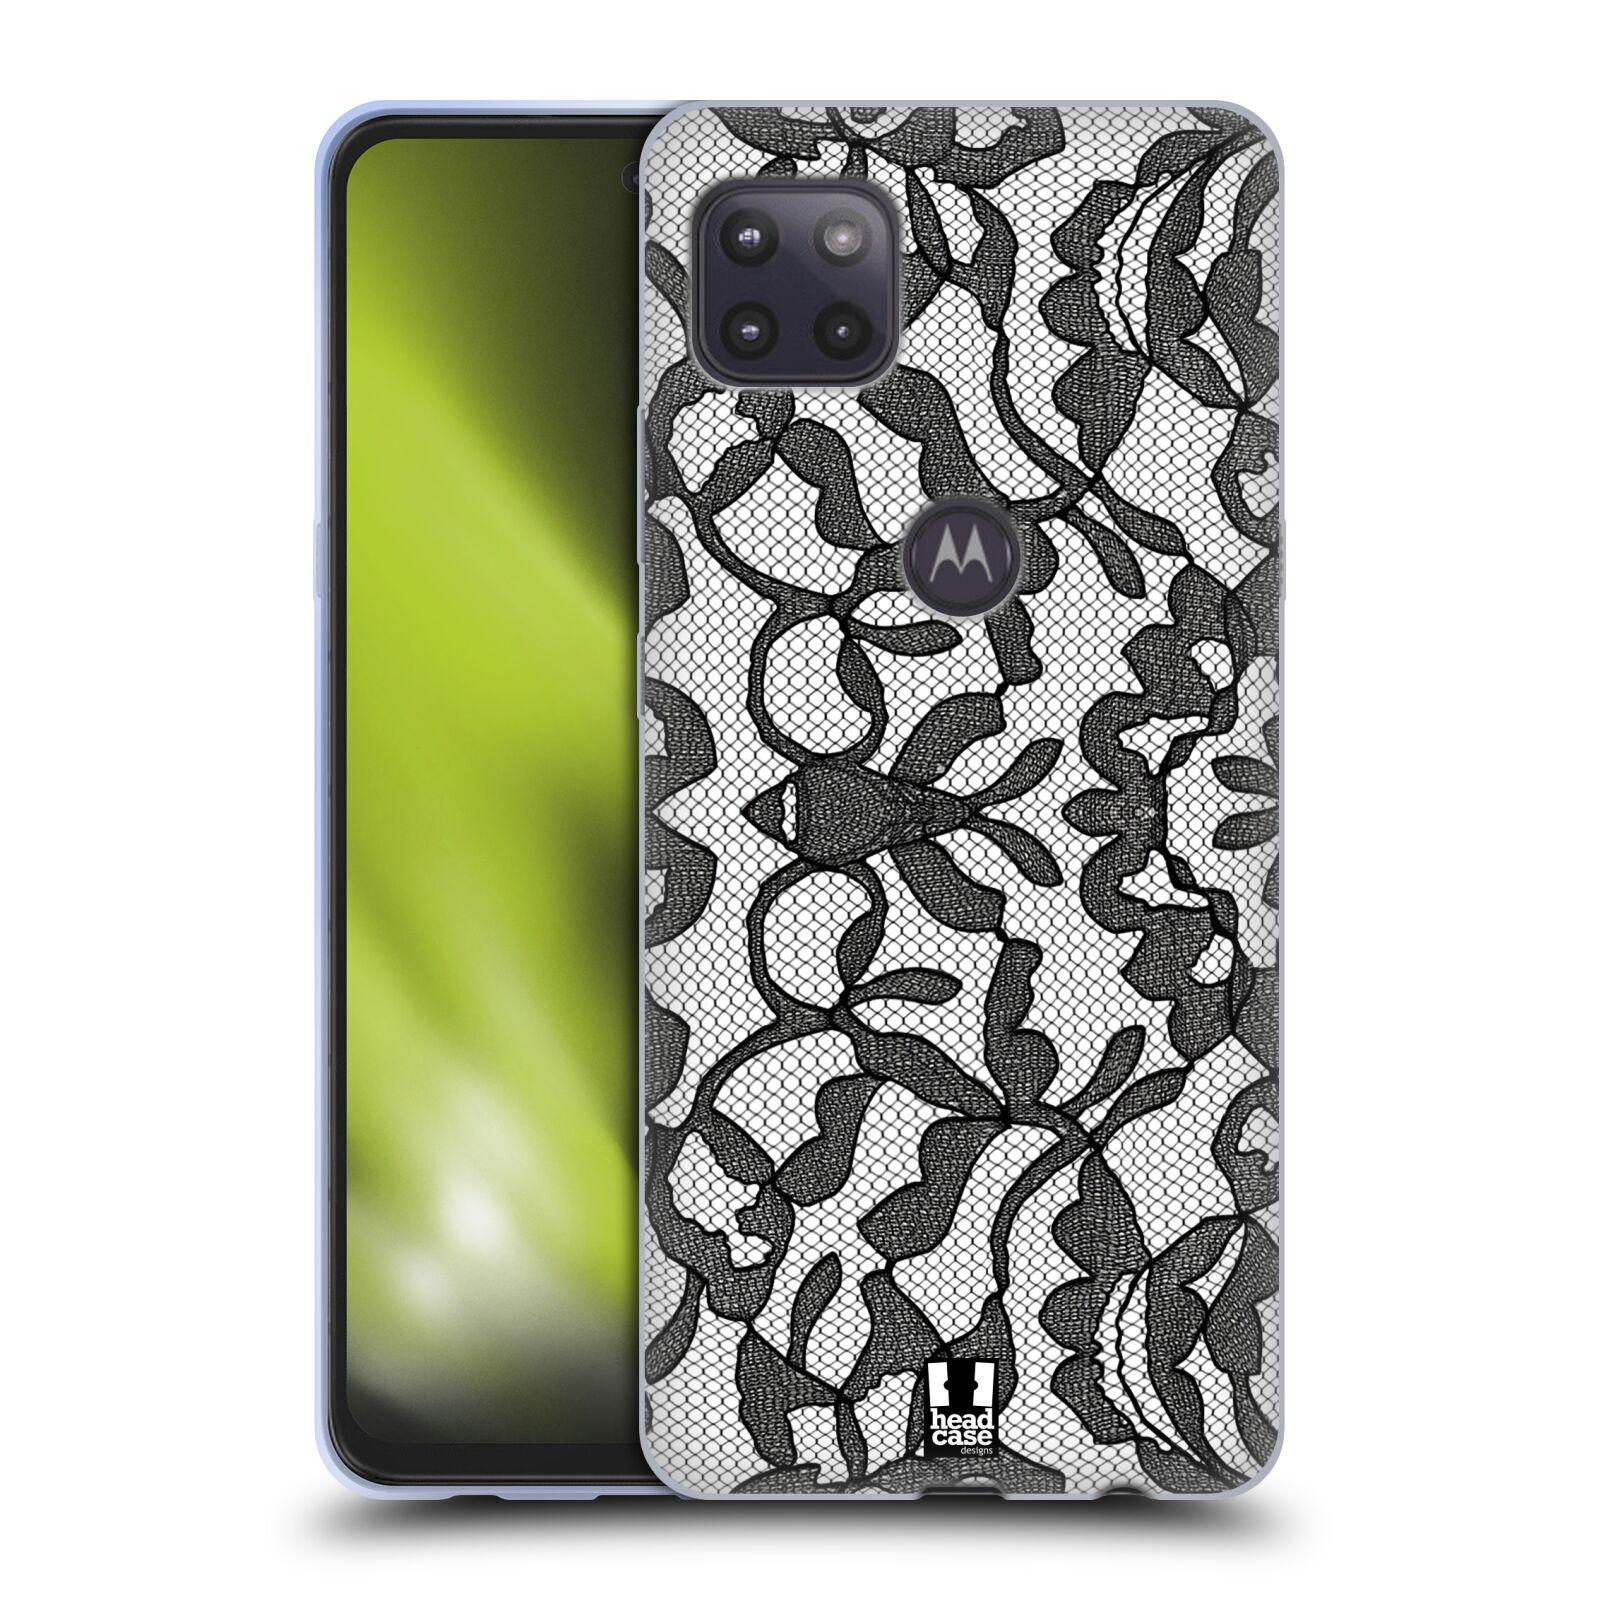 Silikonové pouzdro na mobil Motorola Moto G 5G - Head Case - LEAFY KRAJKA